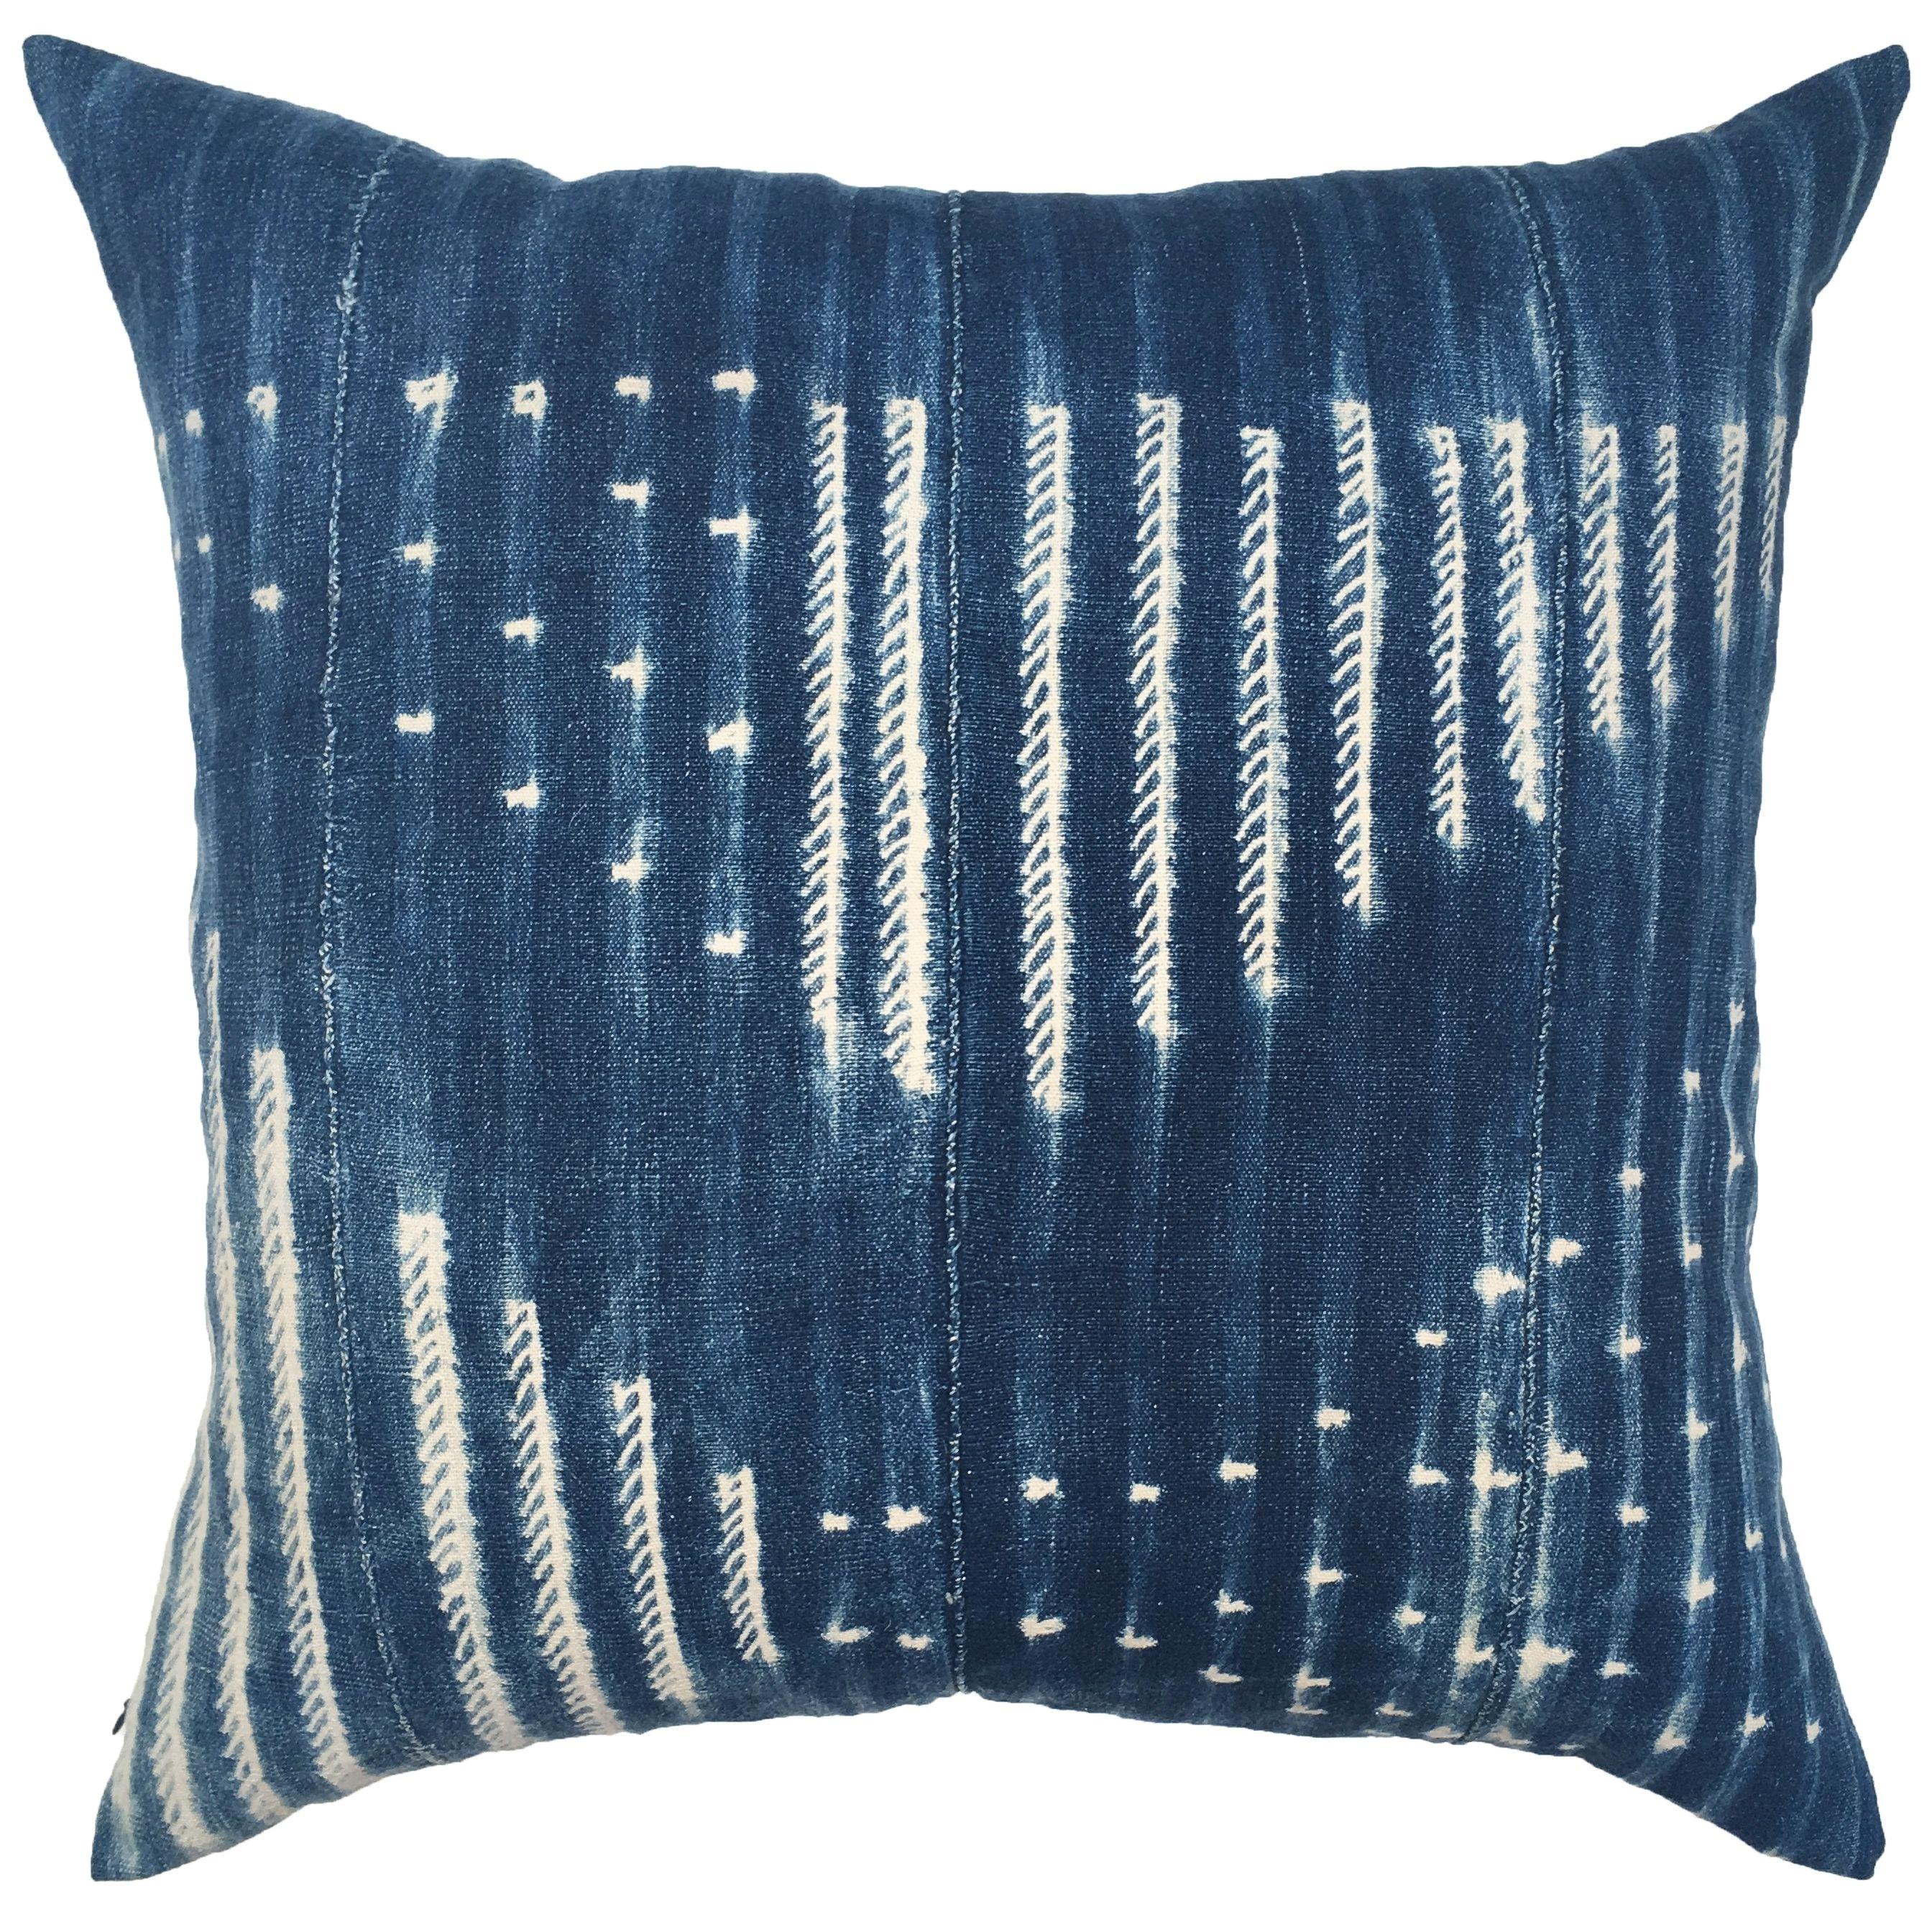 Lulu Georgia Yadira One Of A Kind Indigo Mudcloth Pillow